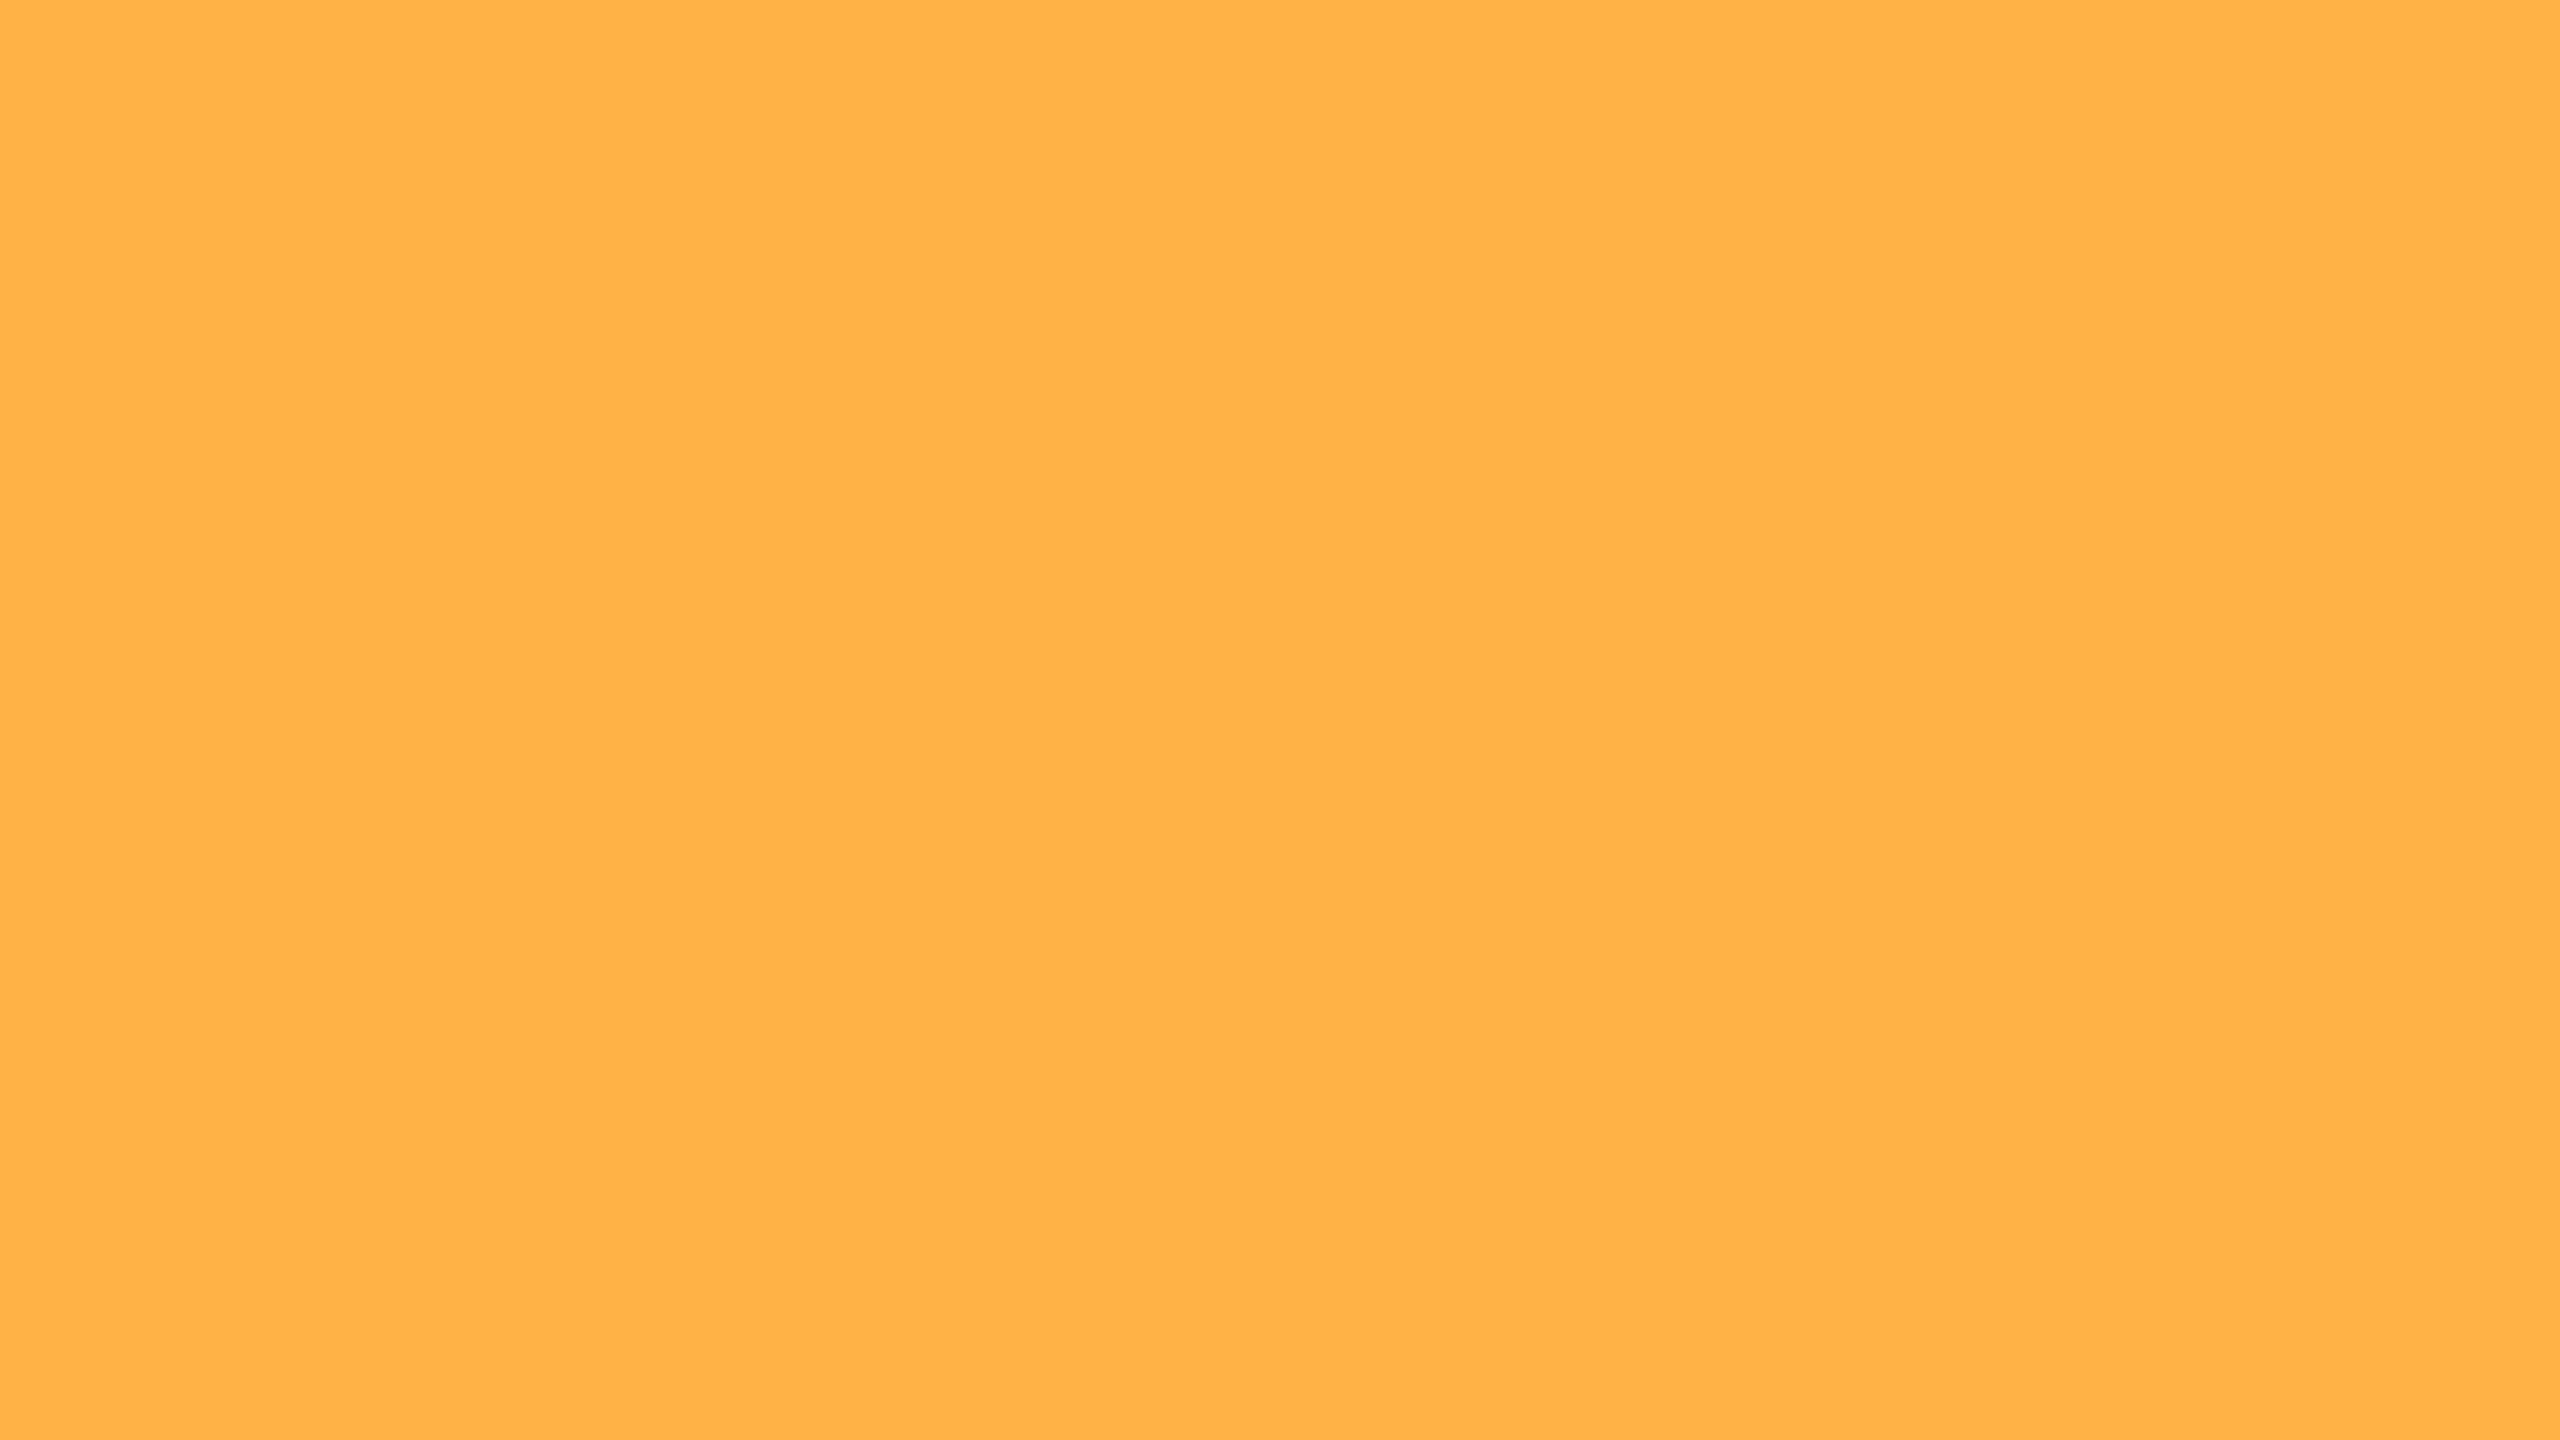 2560x1440 Pastel Orange Solid Color Background